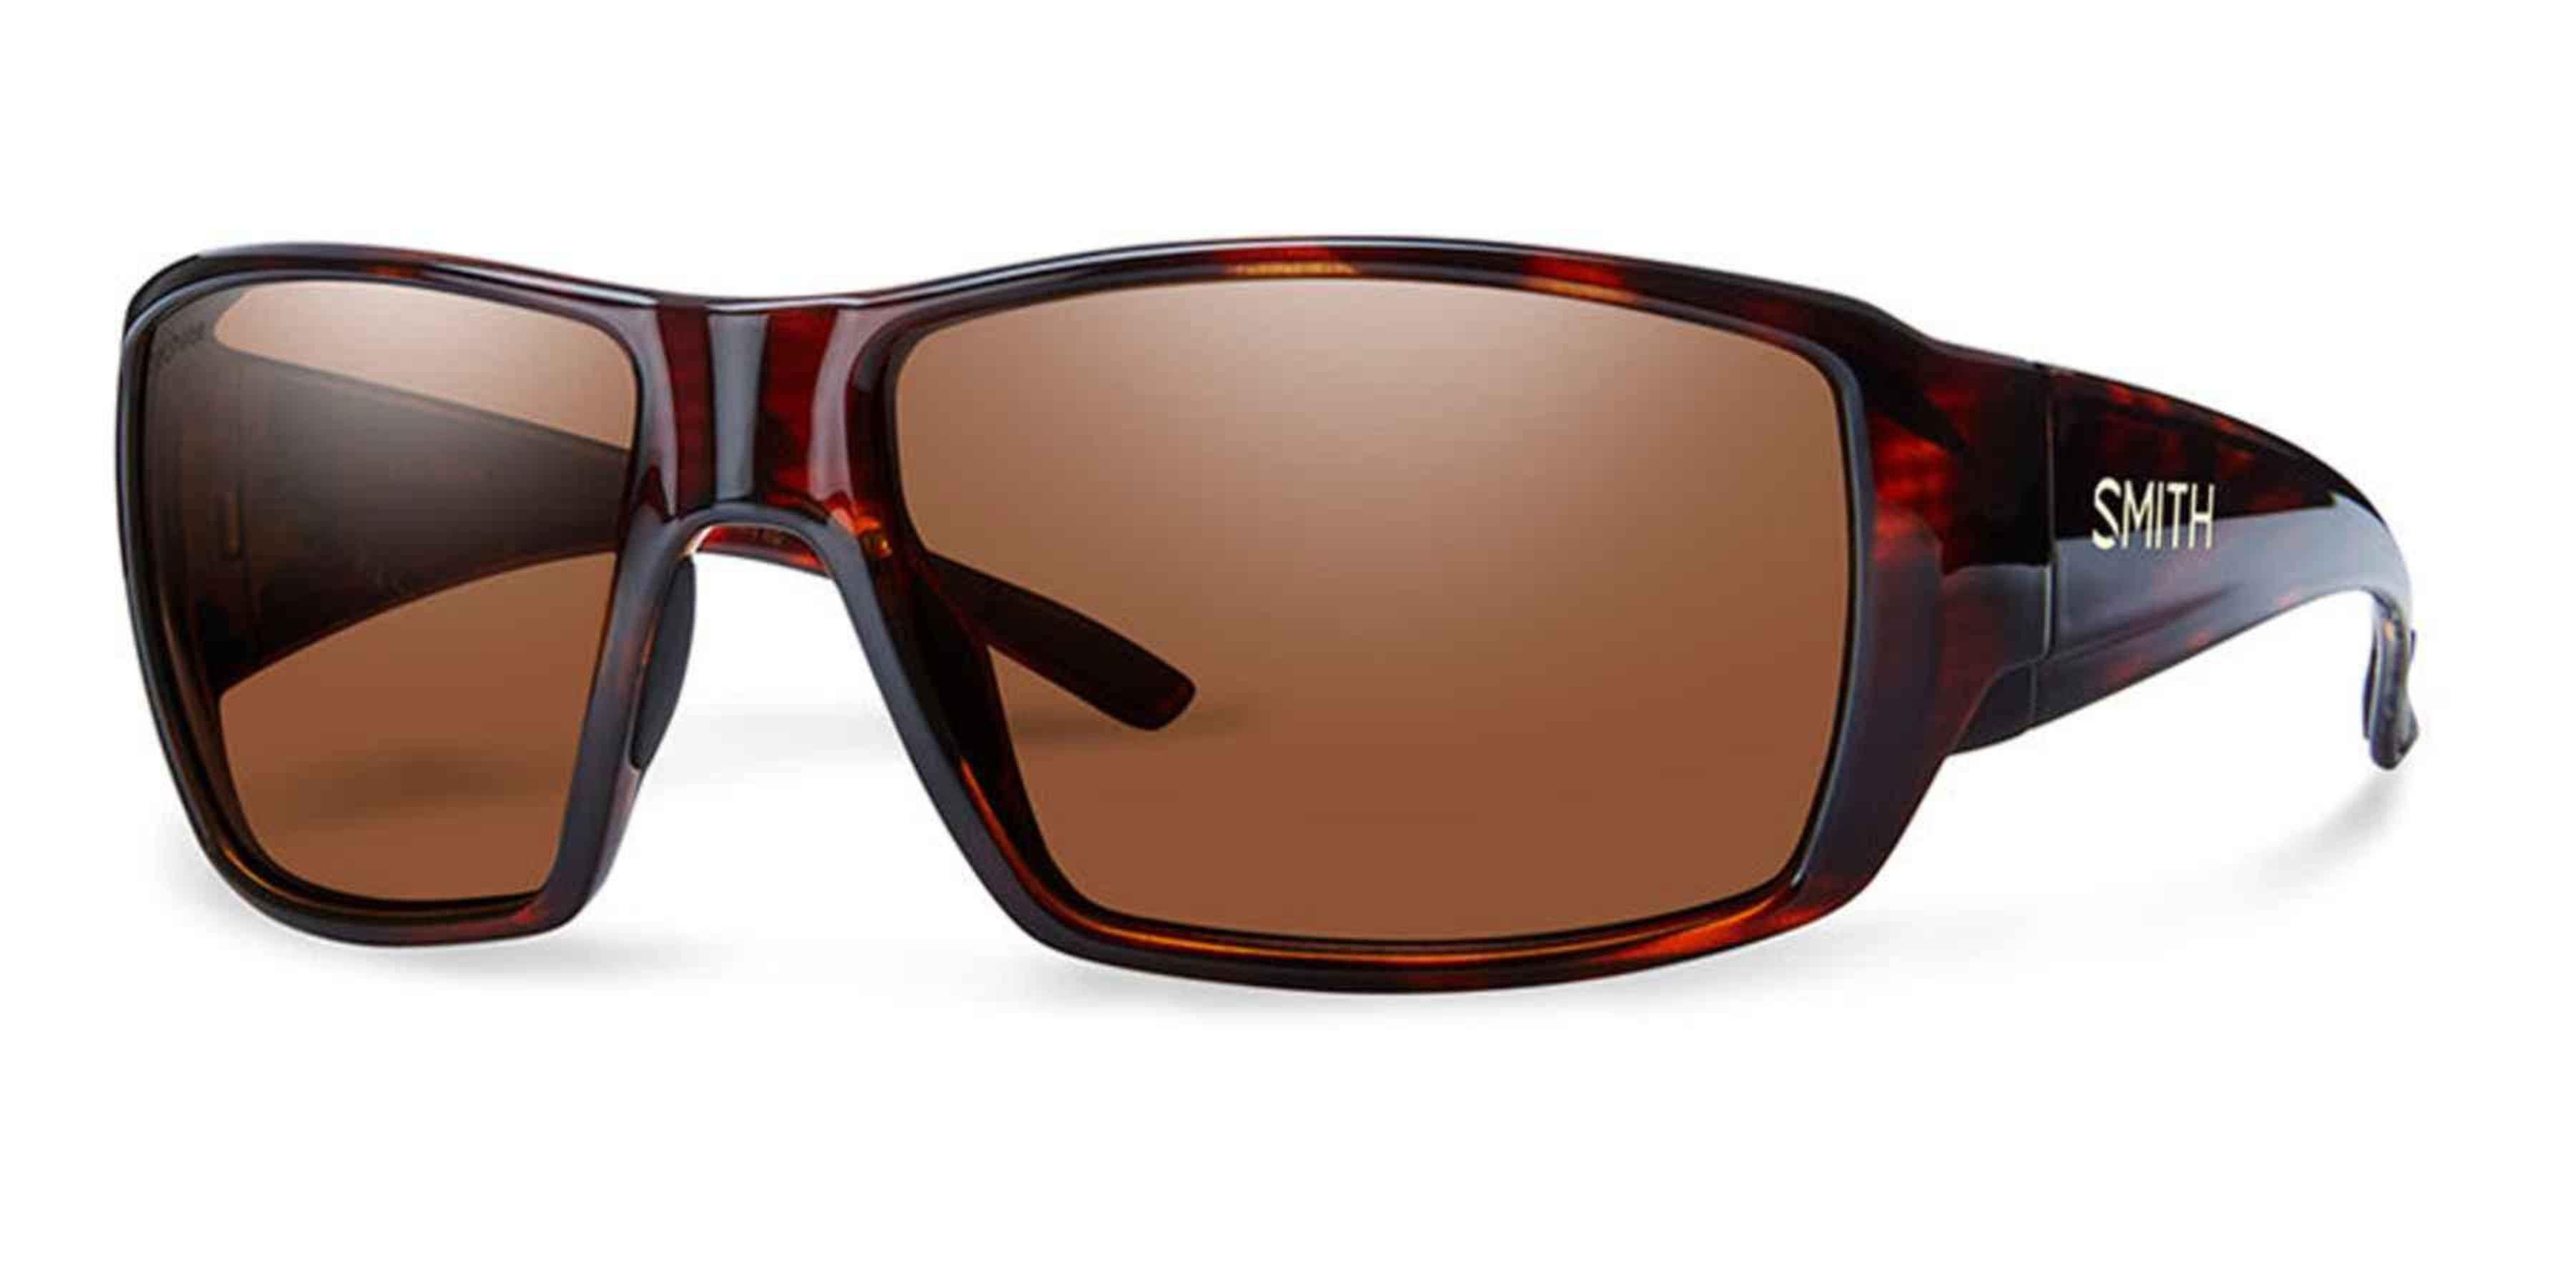 Best fishing sunglasses for 2019 Smith optics sunglasses